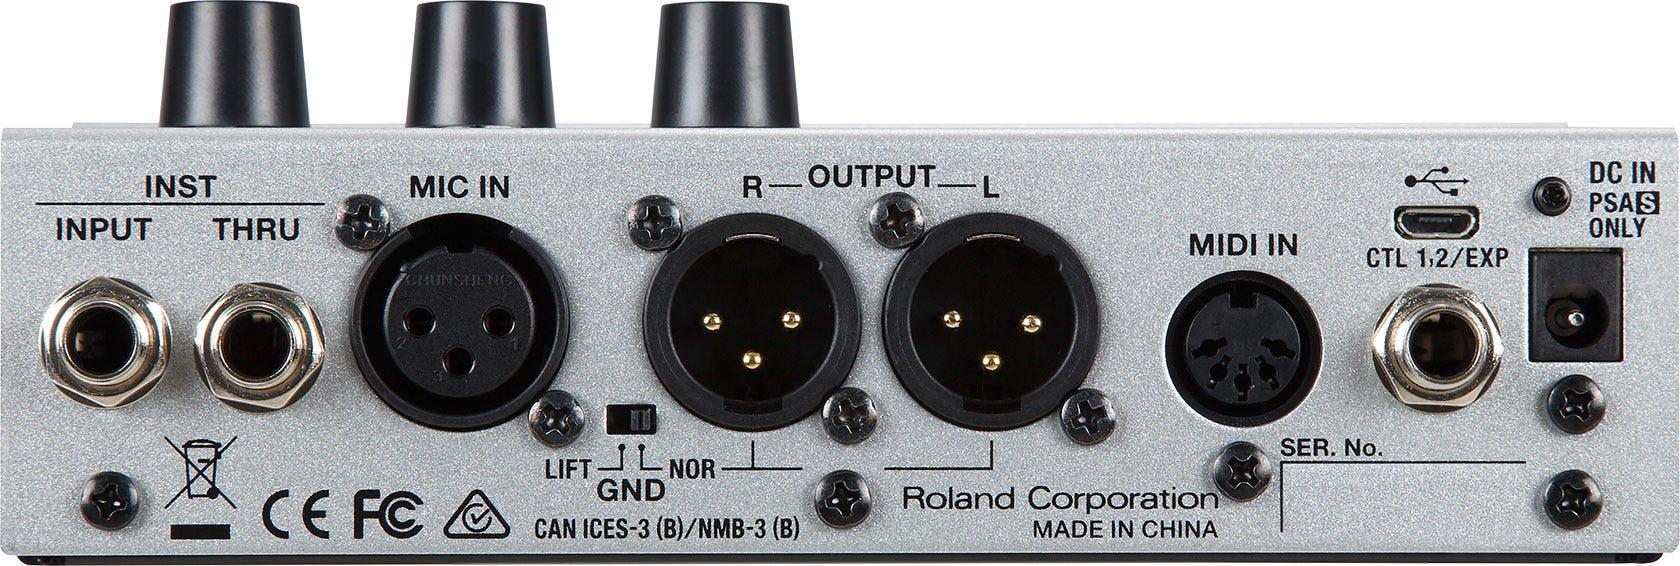 Boss VE-500 Vocal Performer Pedal (VE500)